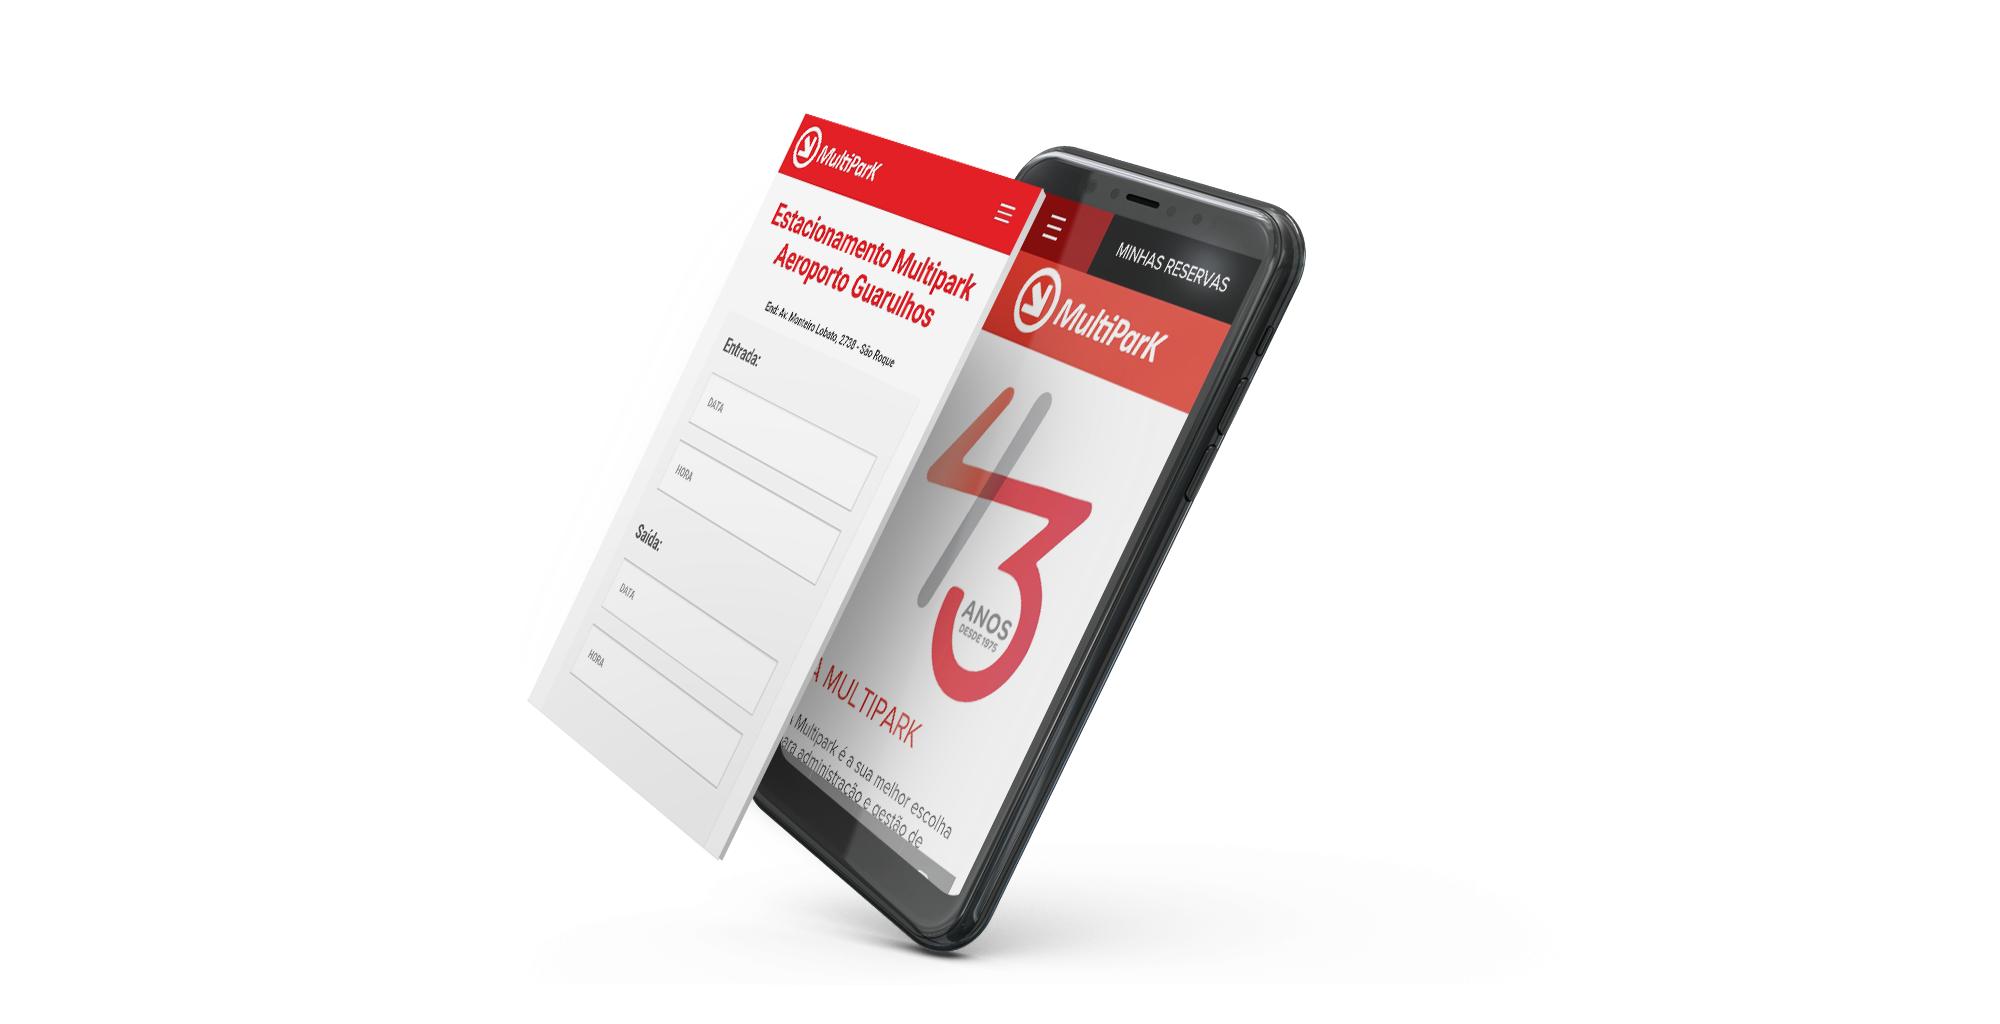 Sistema de reservas online para estacionamentos | MultiPark Estacionamentos